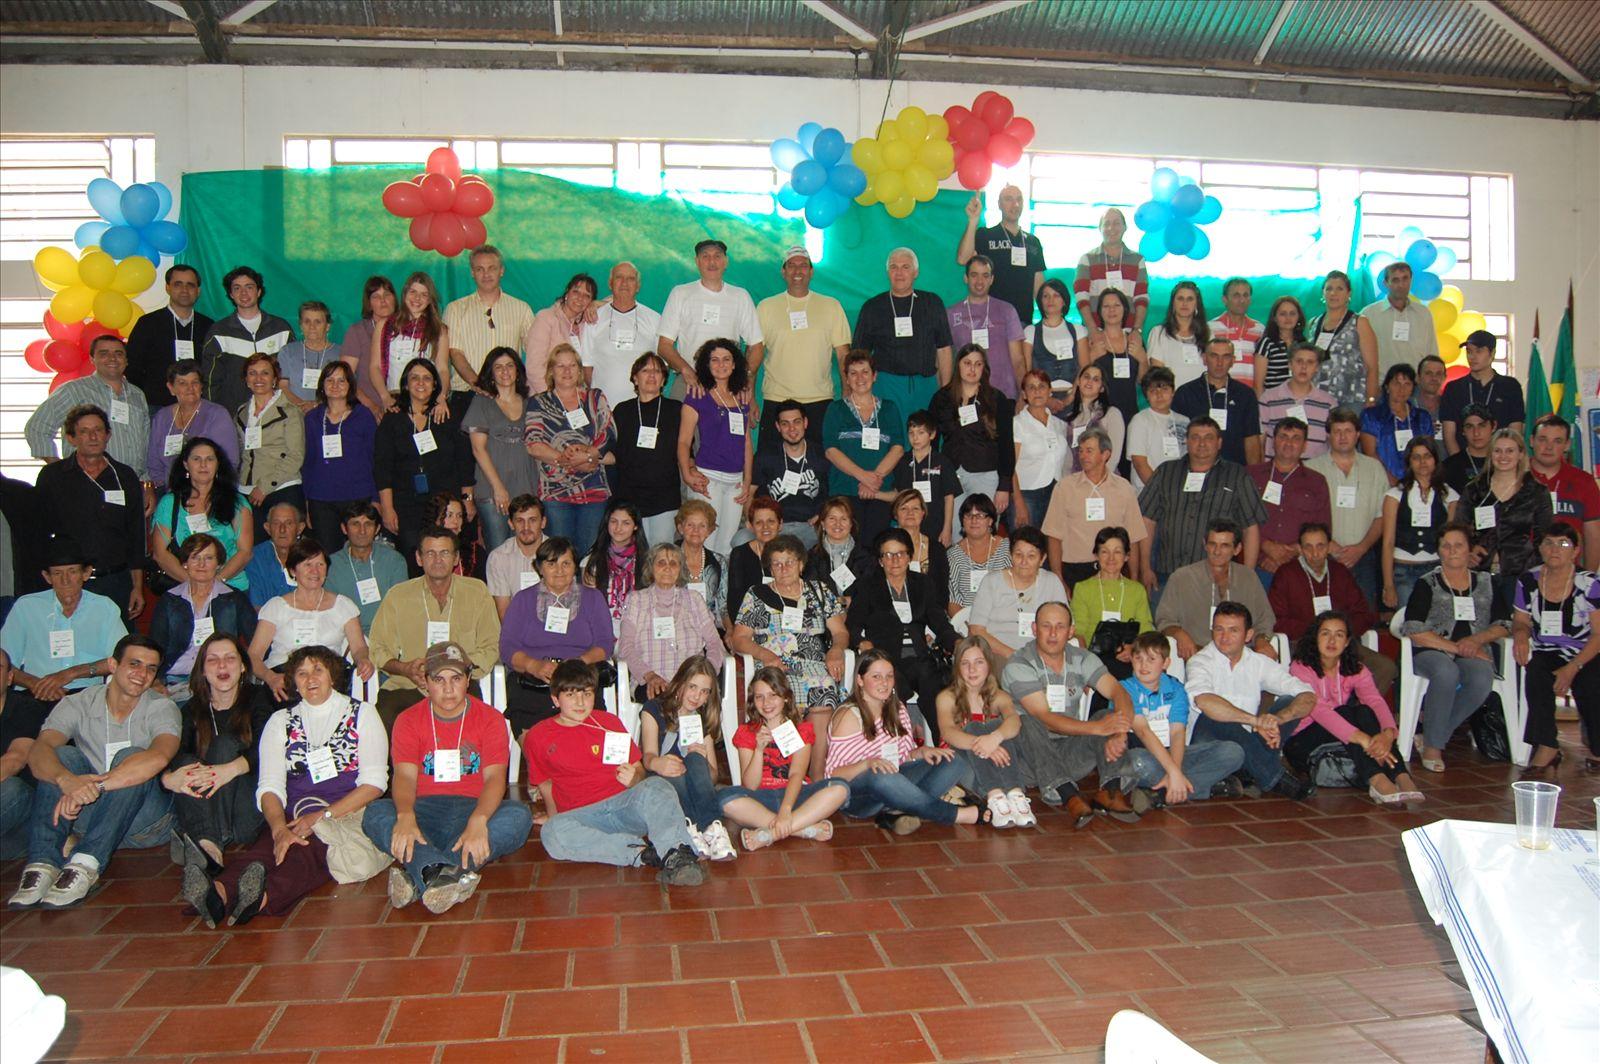 2º Encontro Família Cornelli - 11.10.2009 (160)_0